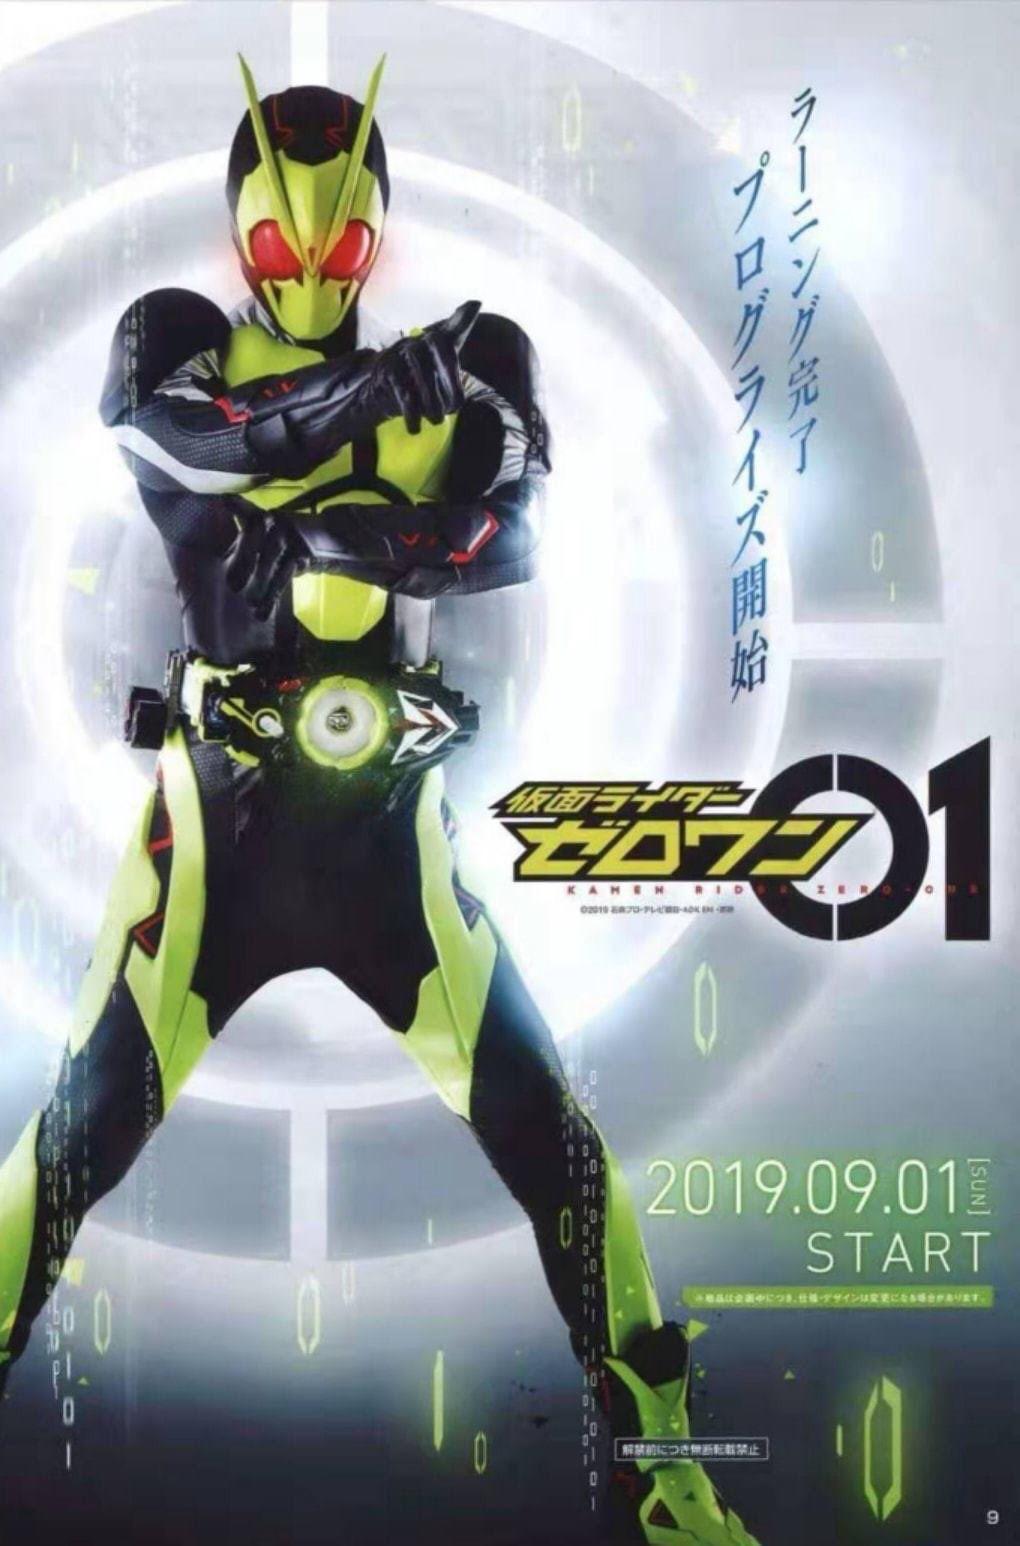 tokusatsu おしゃれまとめの人気アイデア pinterest oimo 仮面ライダー ライダー 特撮ヒーロー